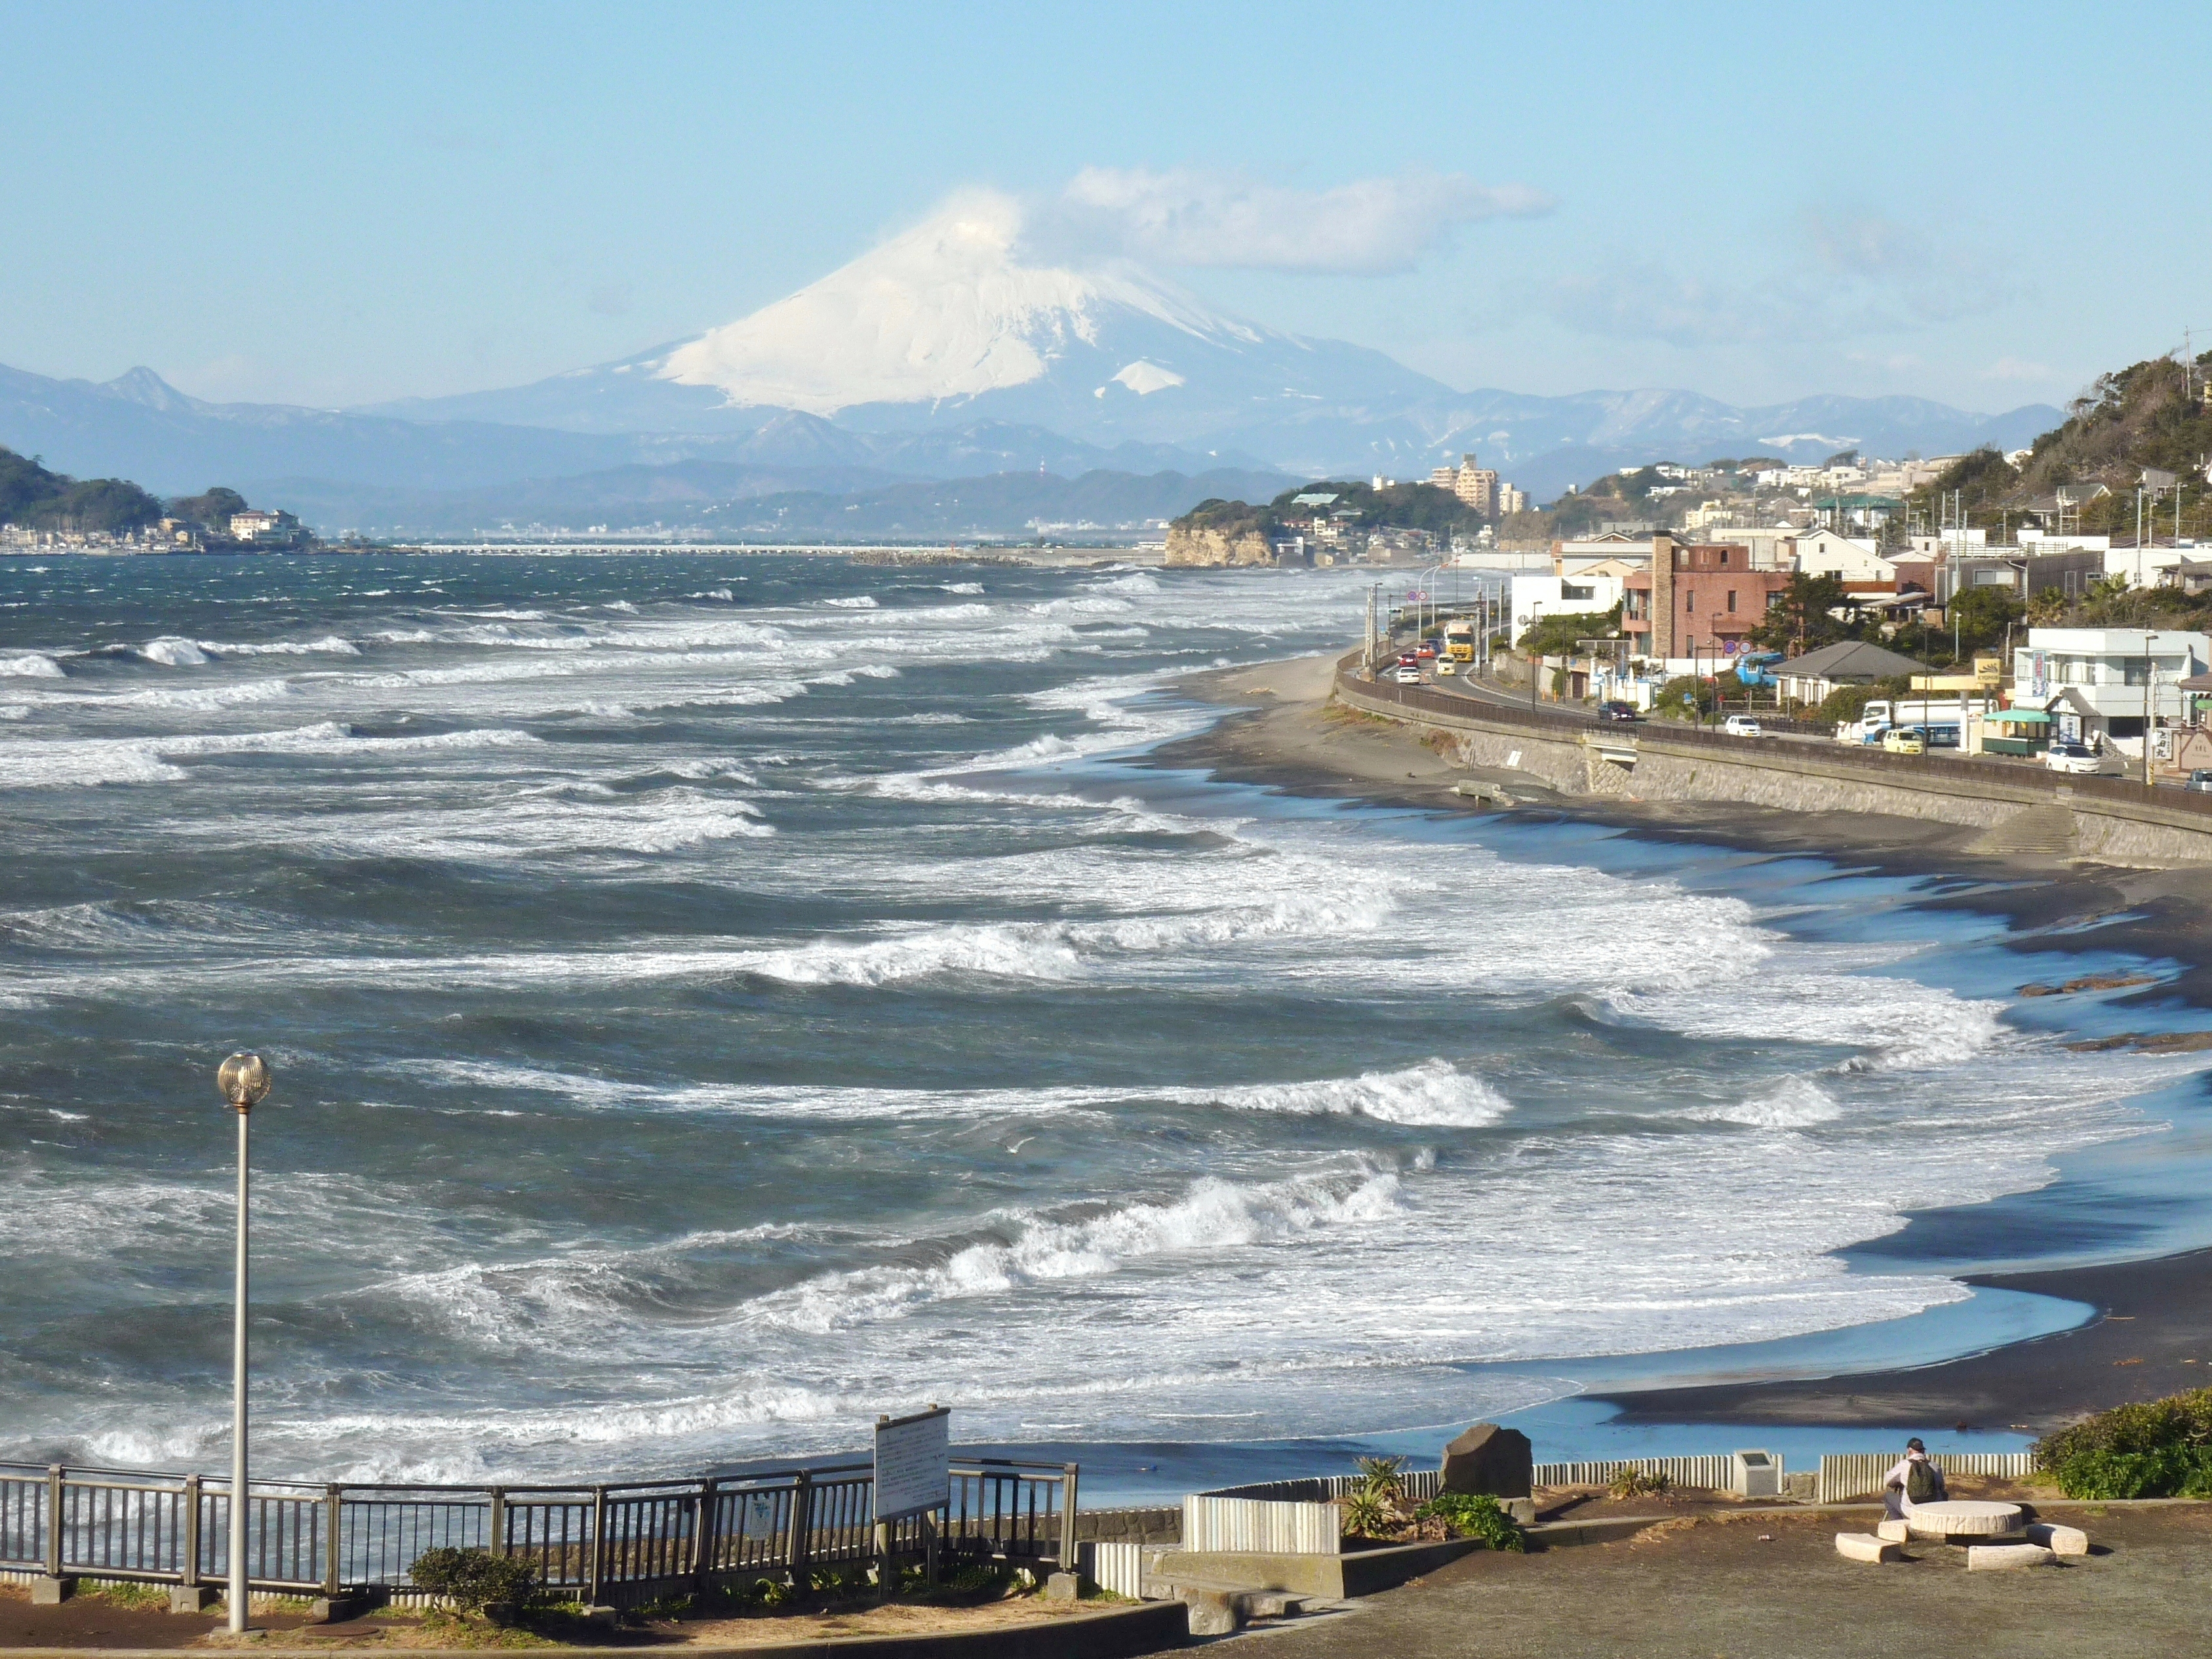 https://upload.wikimedia.org/wikipedia/commons/f/f9/Mt._Fuji_from_Inamuragasaki_02.jpg